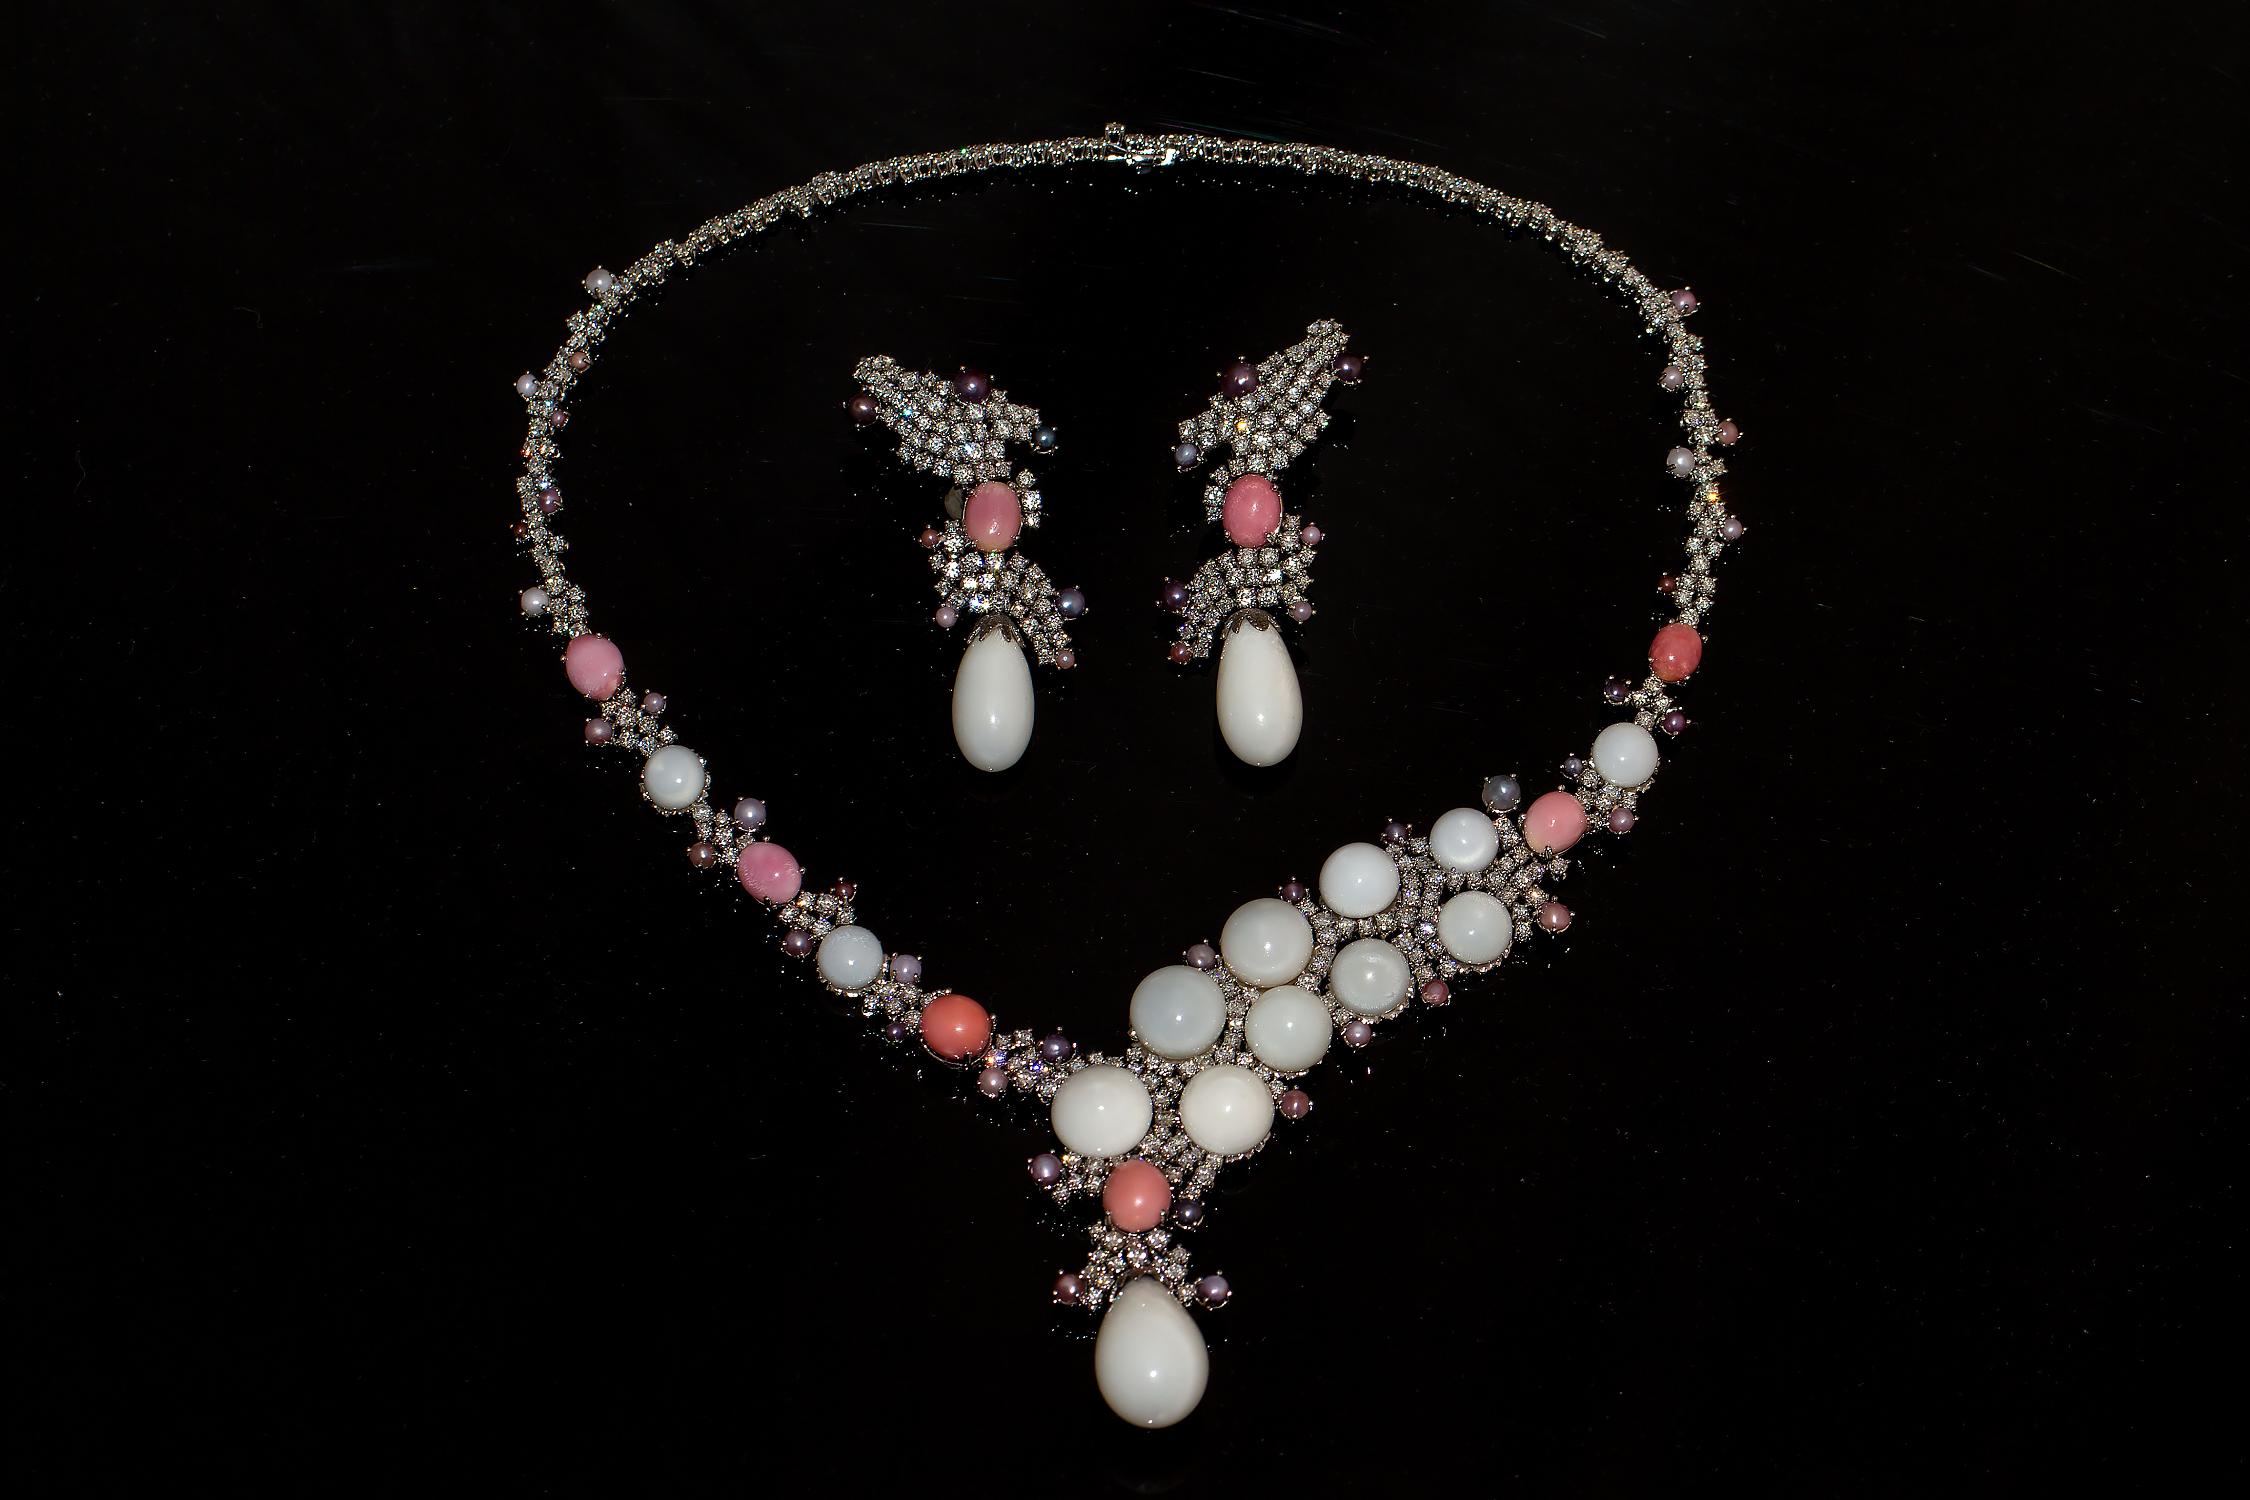 Haute joaillerie parure natural pearls - Shanghai Gems